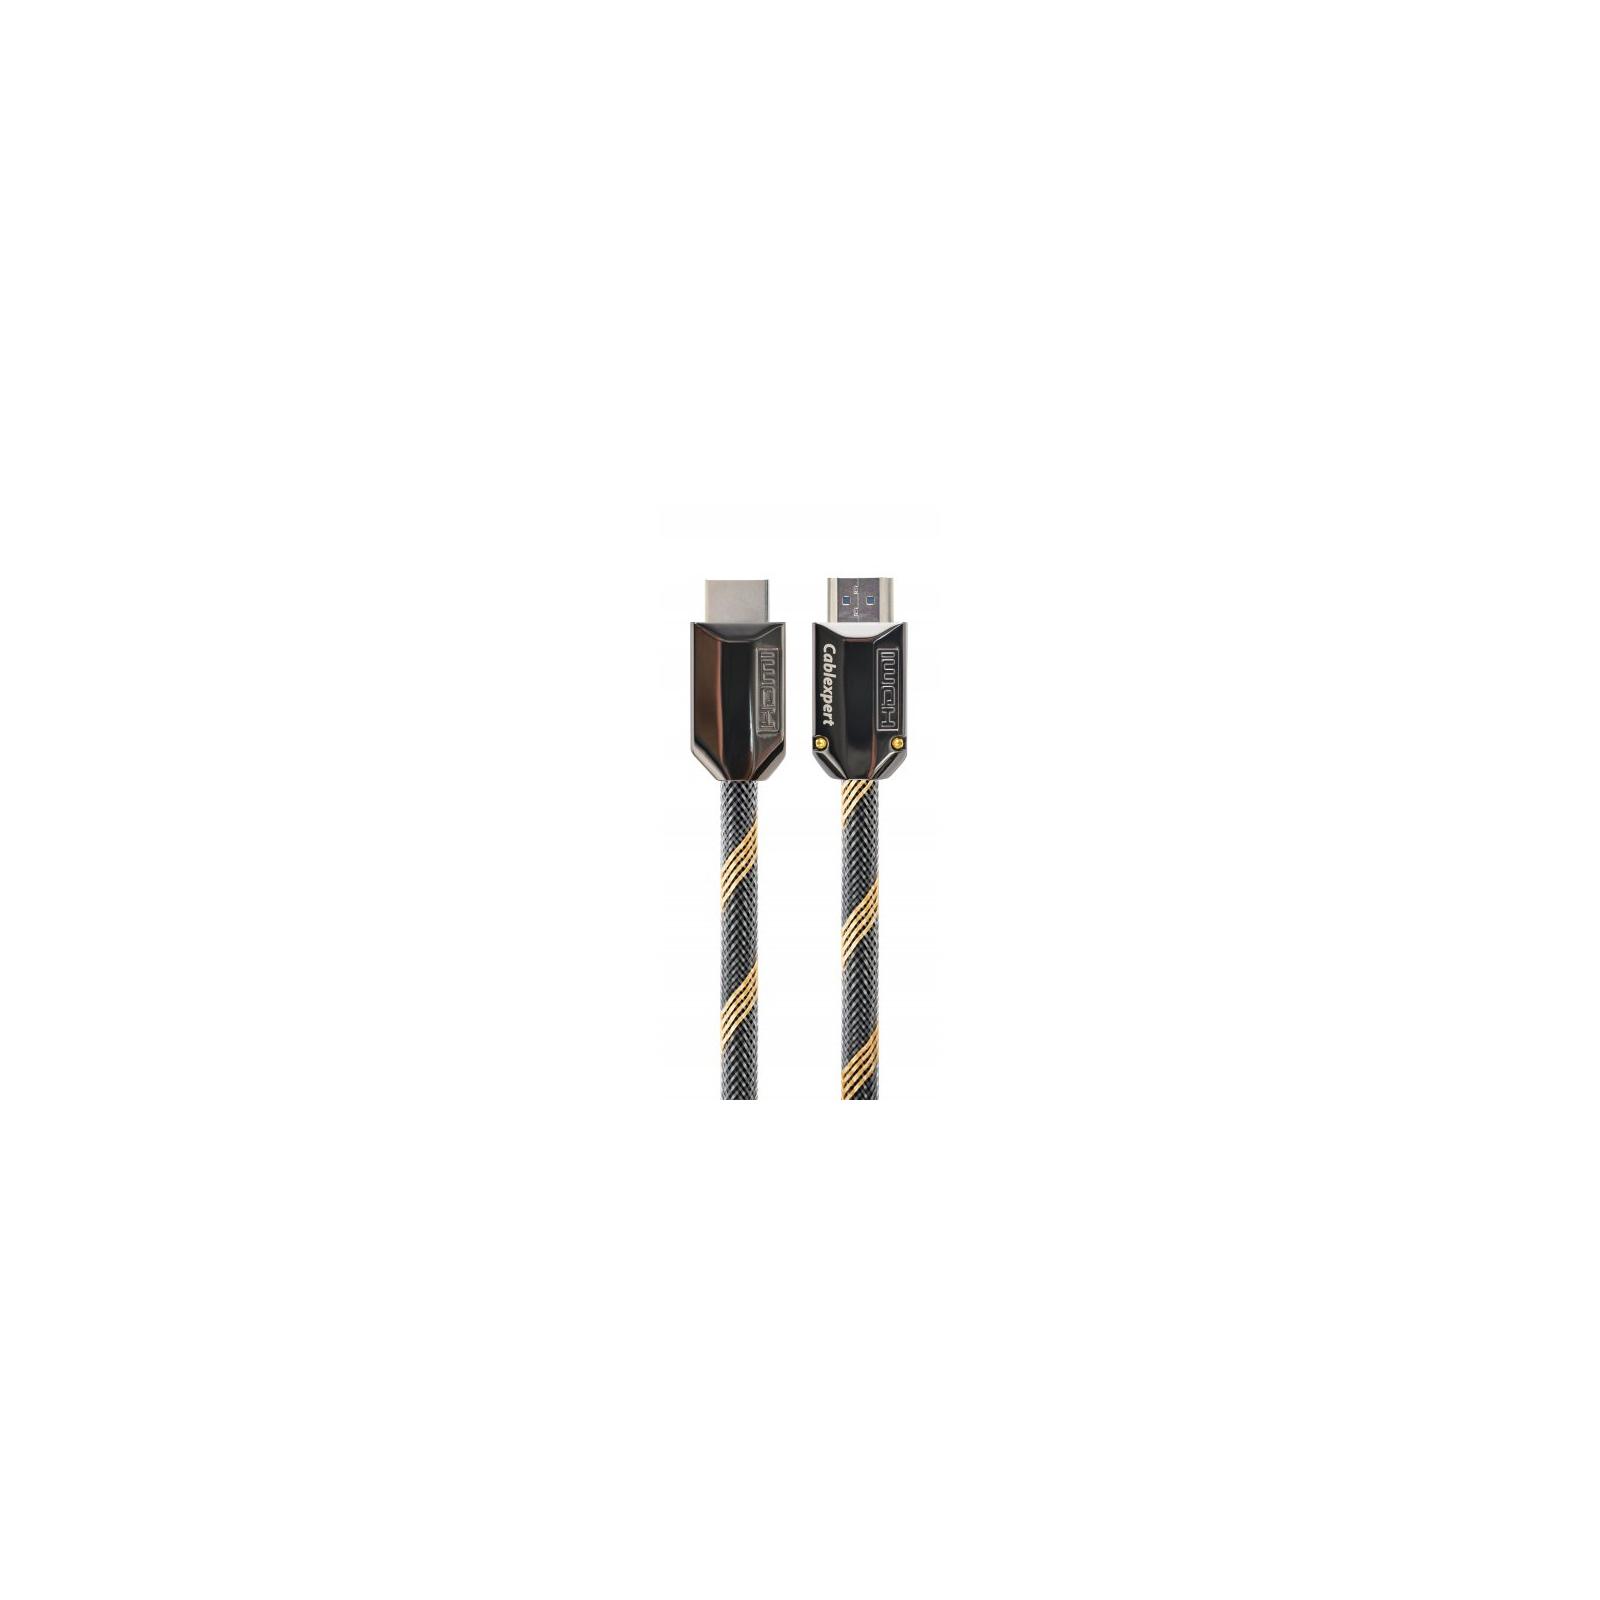 Кабель мультимедийный HDMI to HDMI 1.0m V2.0b Cablexpert (CCBP-HDMIPCC-1M)